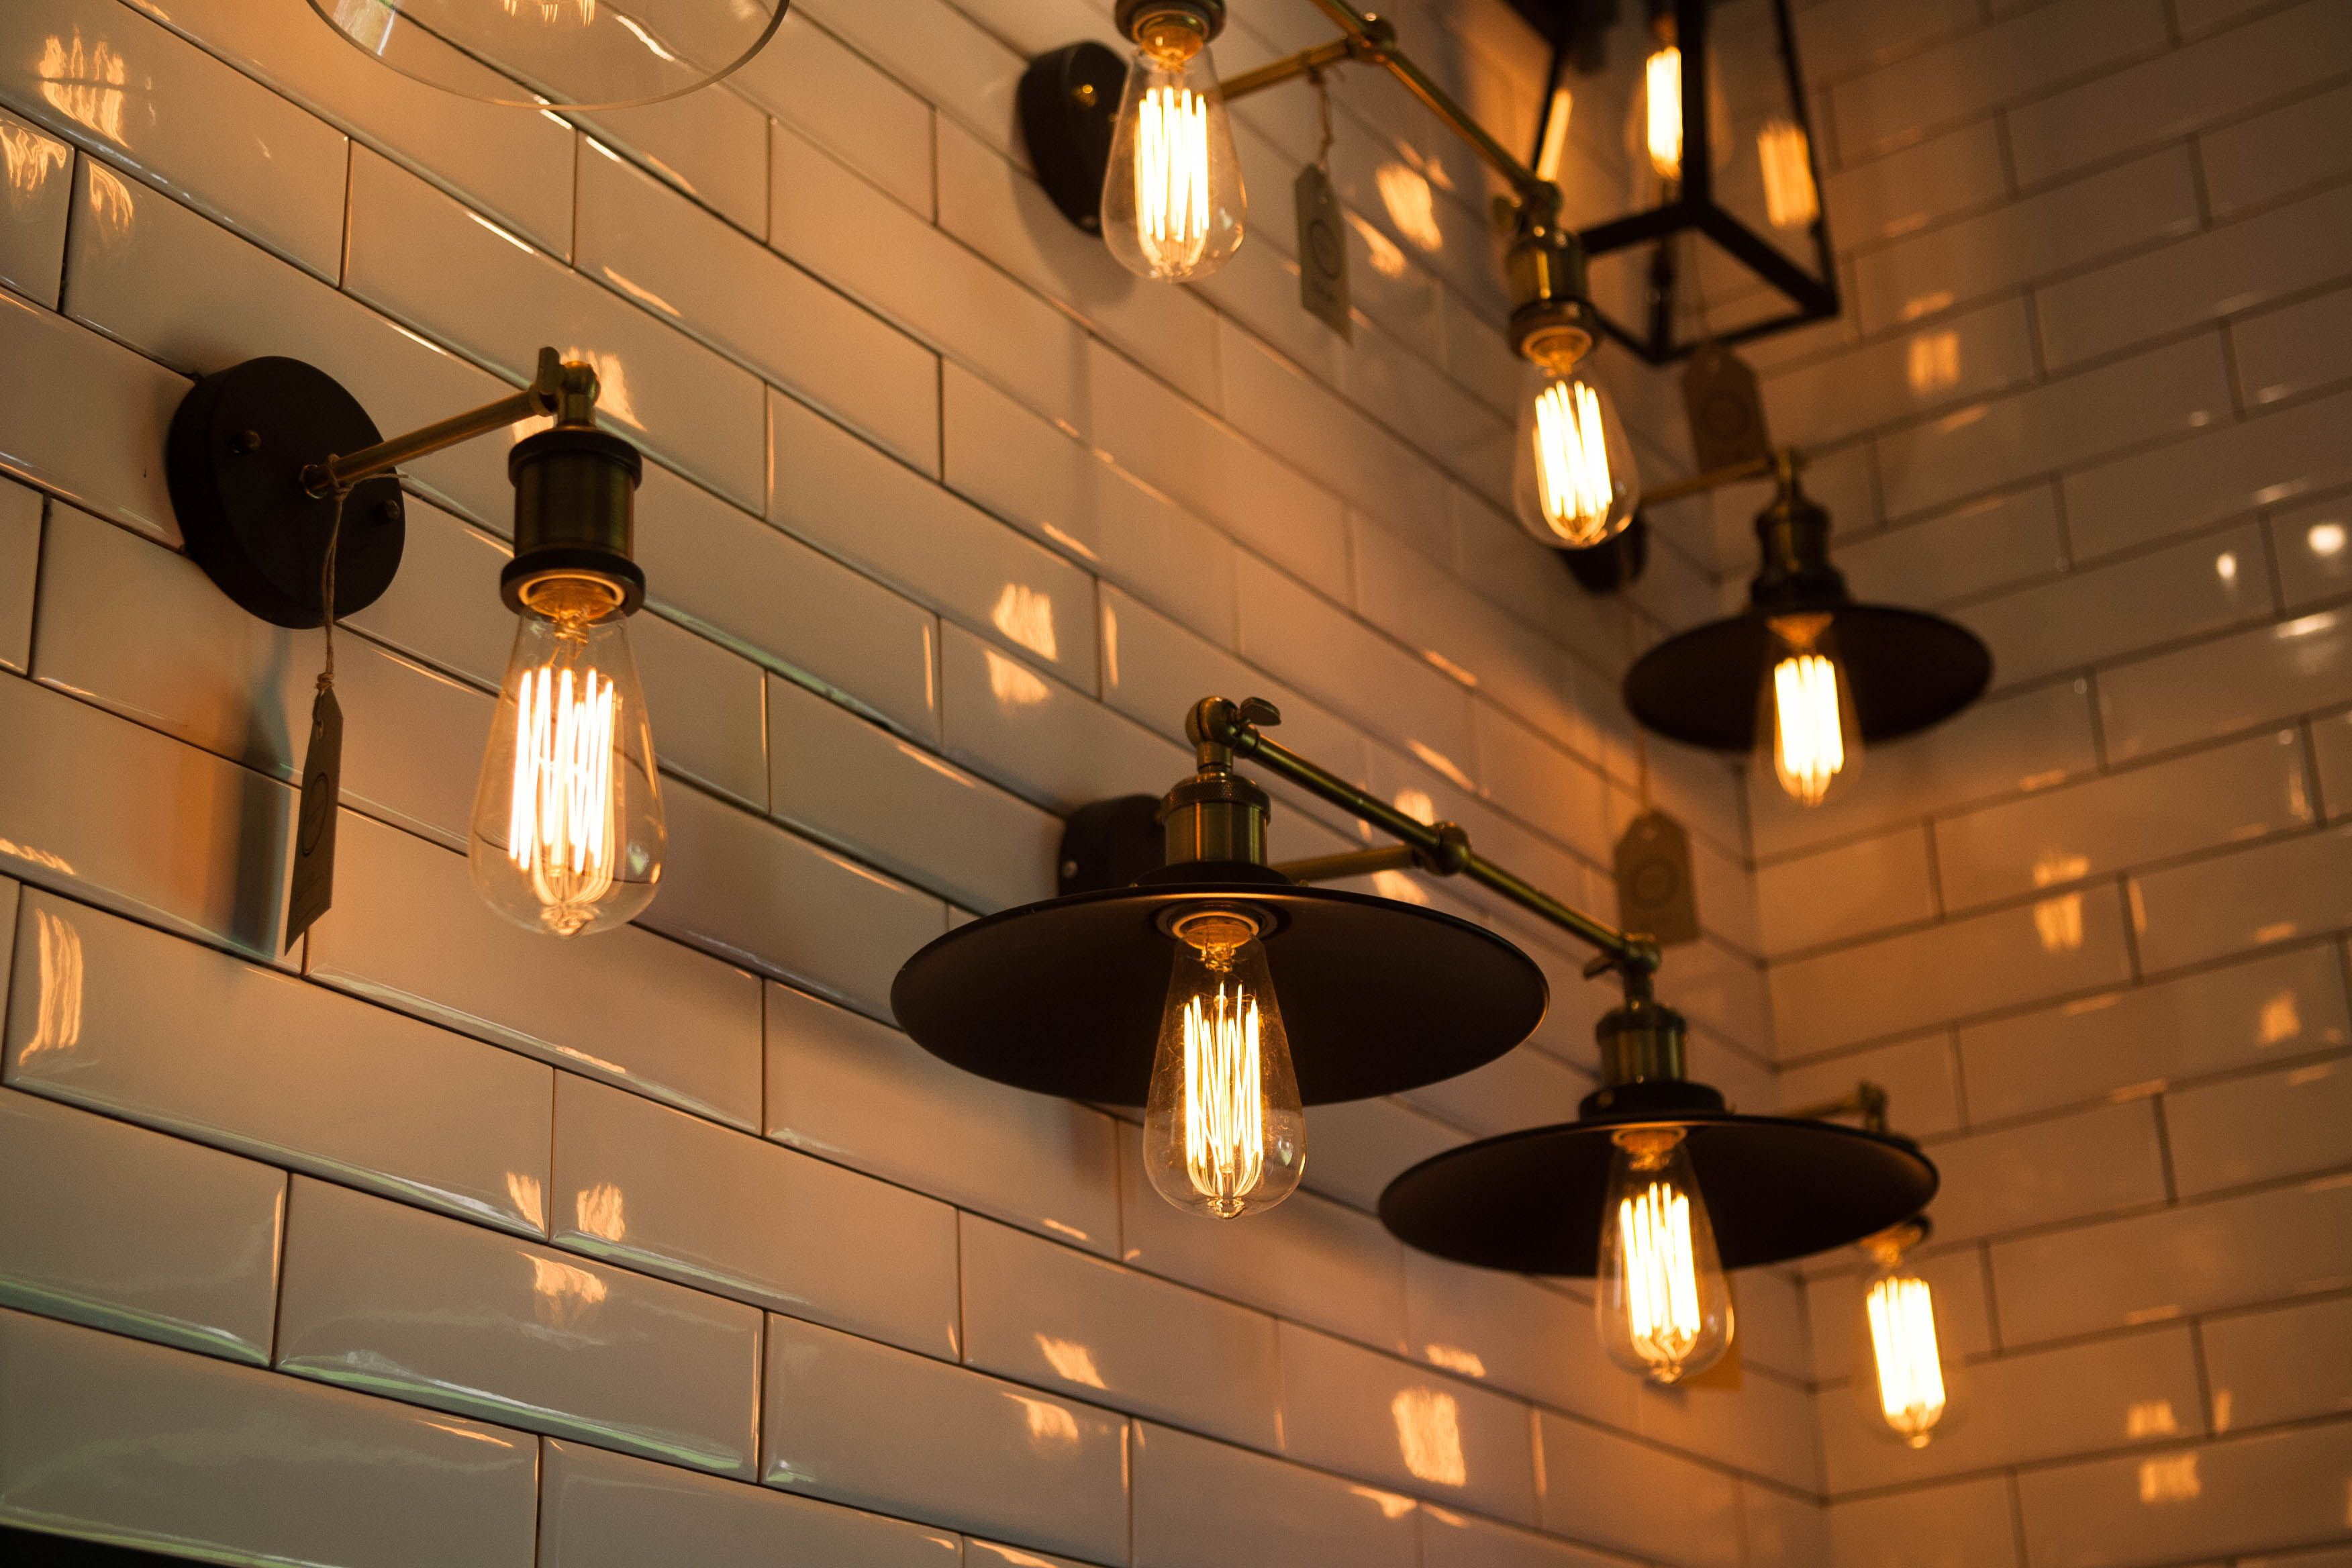 branche lumineuse casa fabulous masinfinito casa luminarias en el local de montevideo uruguay. Black Bedroom Furniture Sets. Home Design Ideas